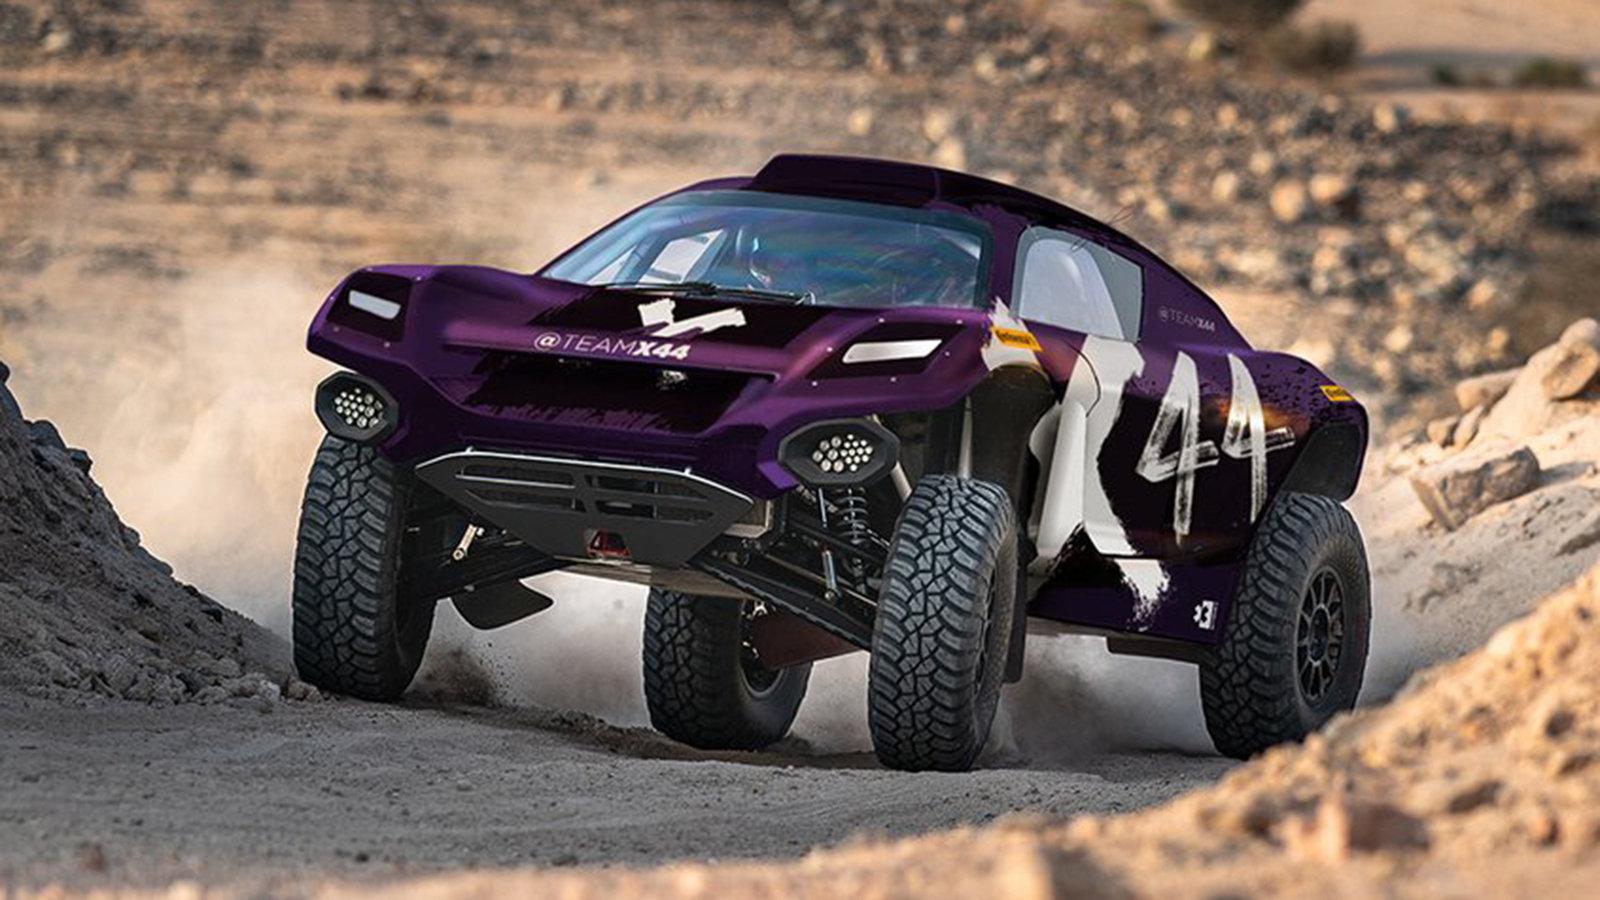 Lewis Hamilton reveals his Severe E auto racing group, X44